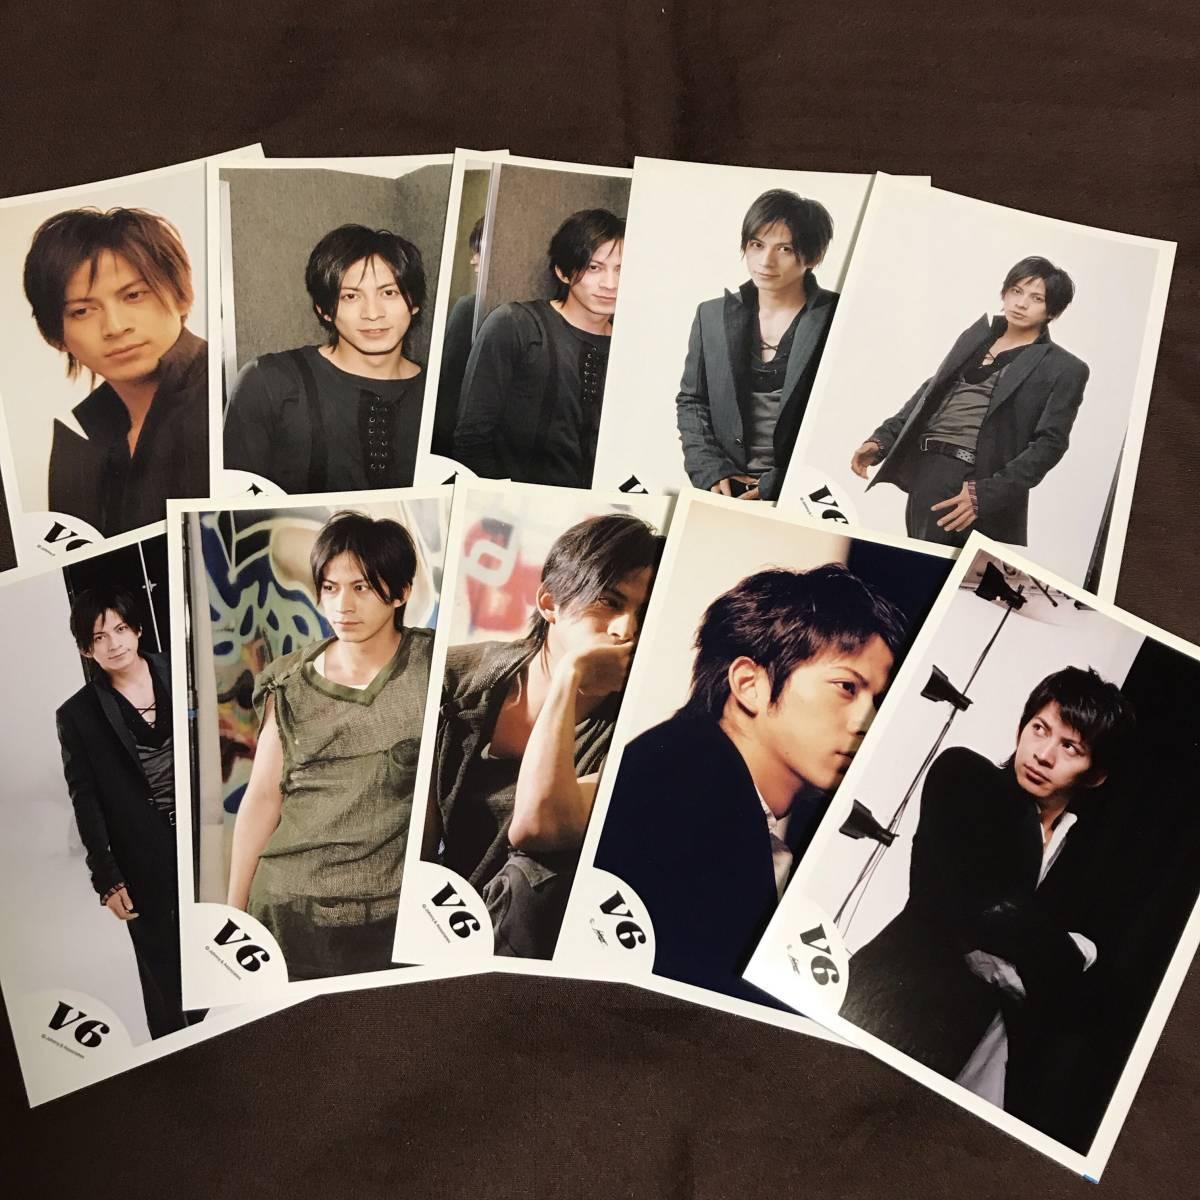 V6 岡田准一 公式写真 写真 ブロマイド グッズ ⑥ コンサートグッズの画像